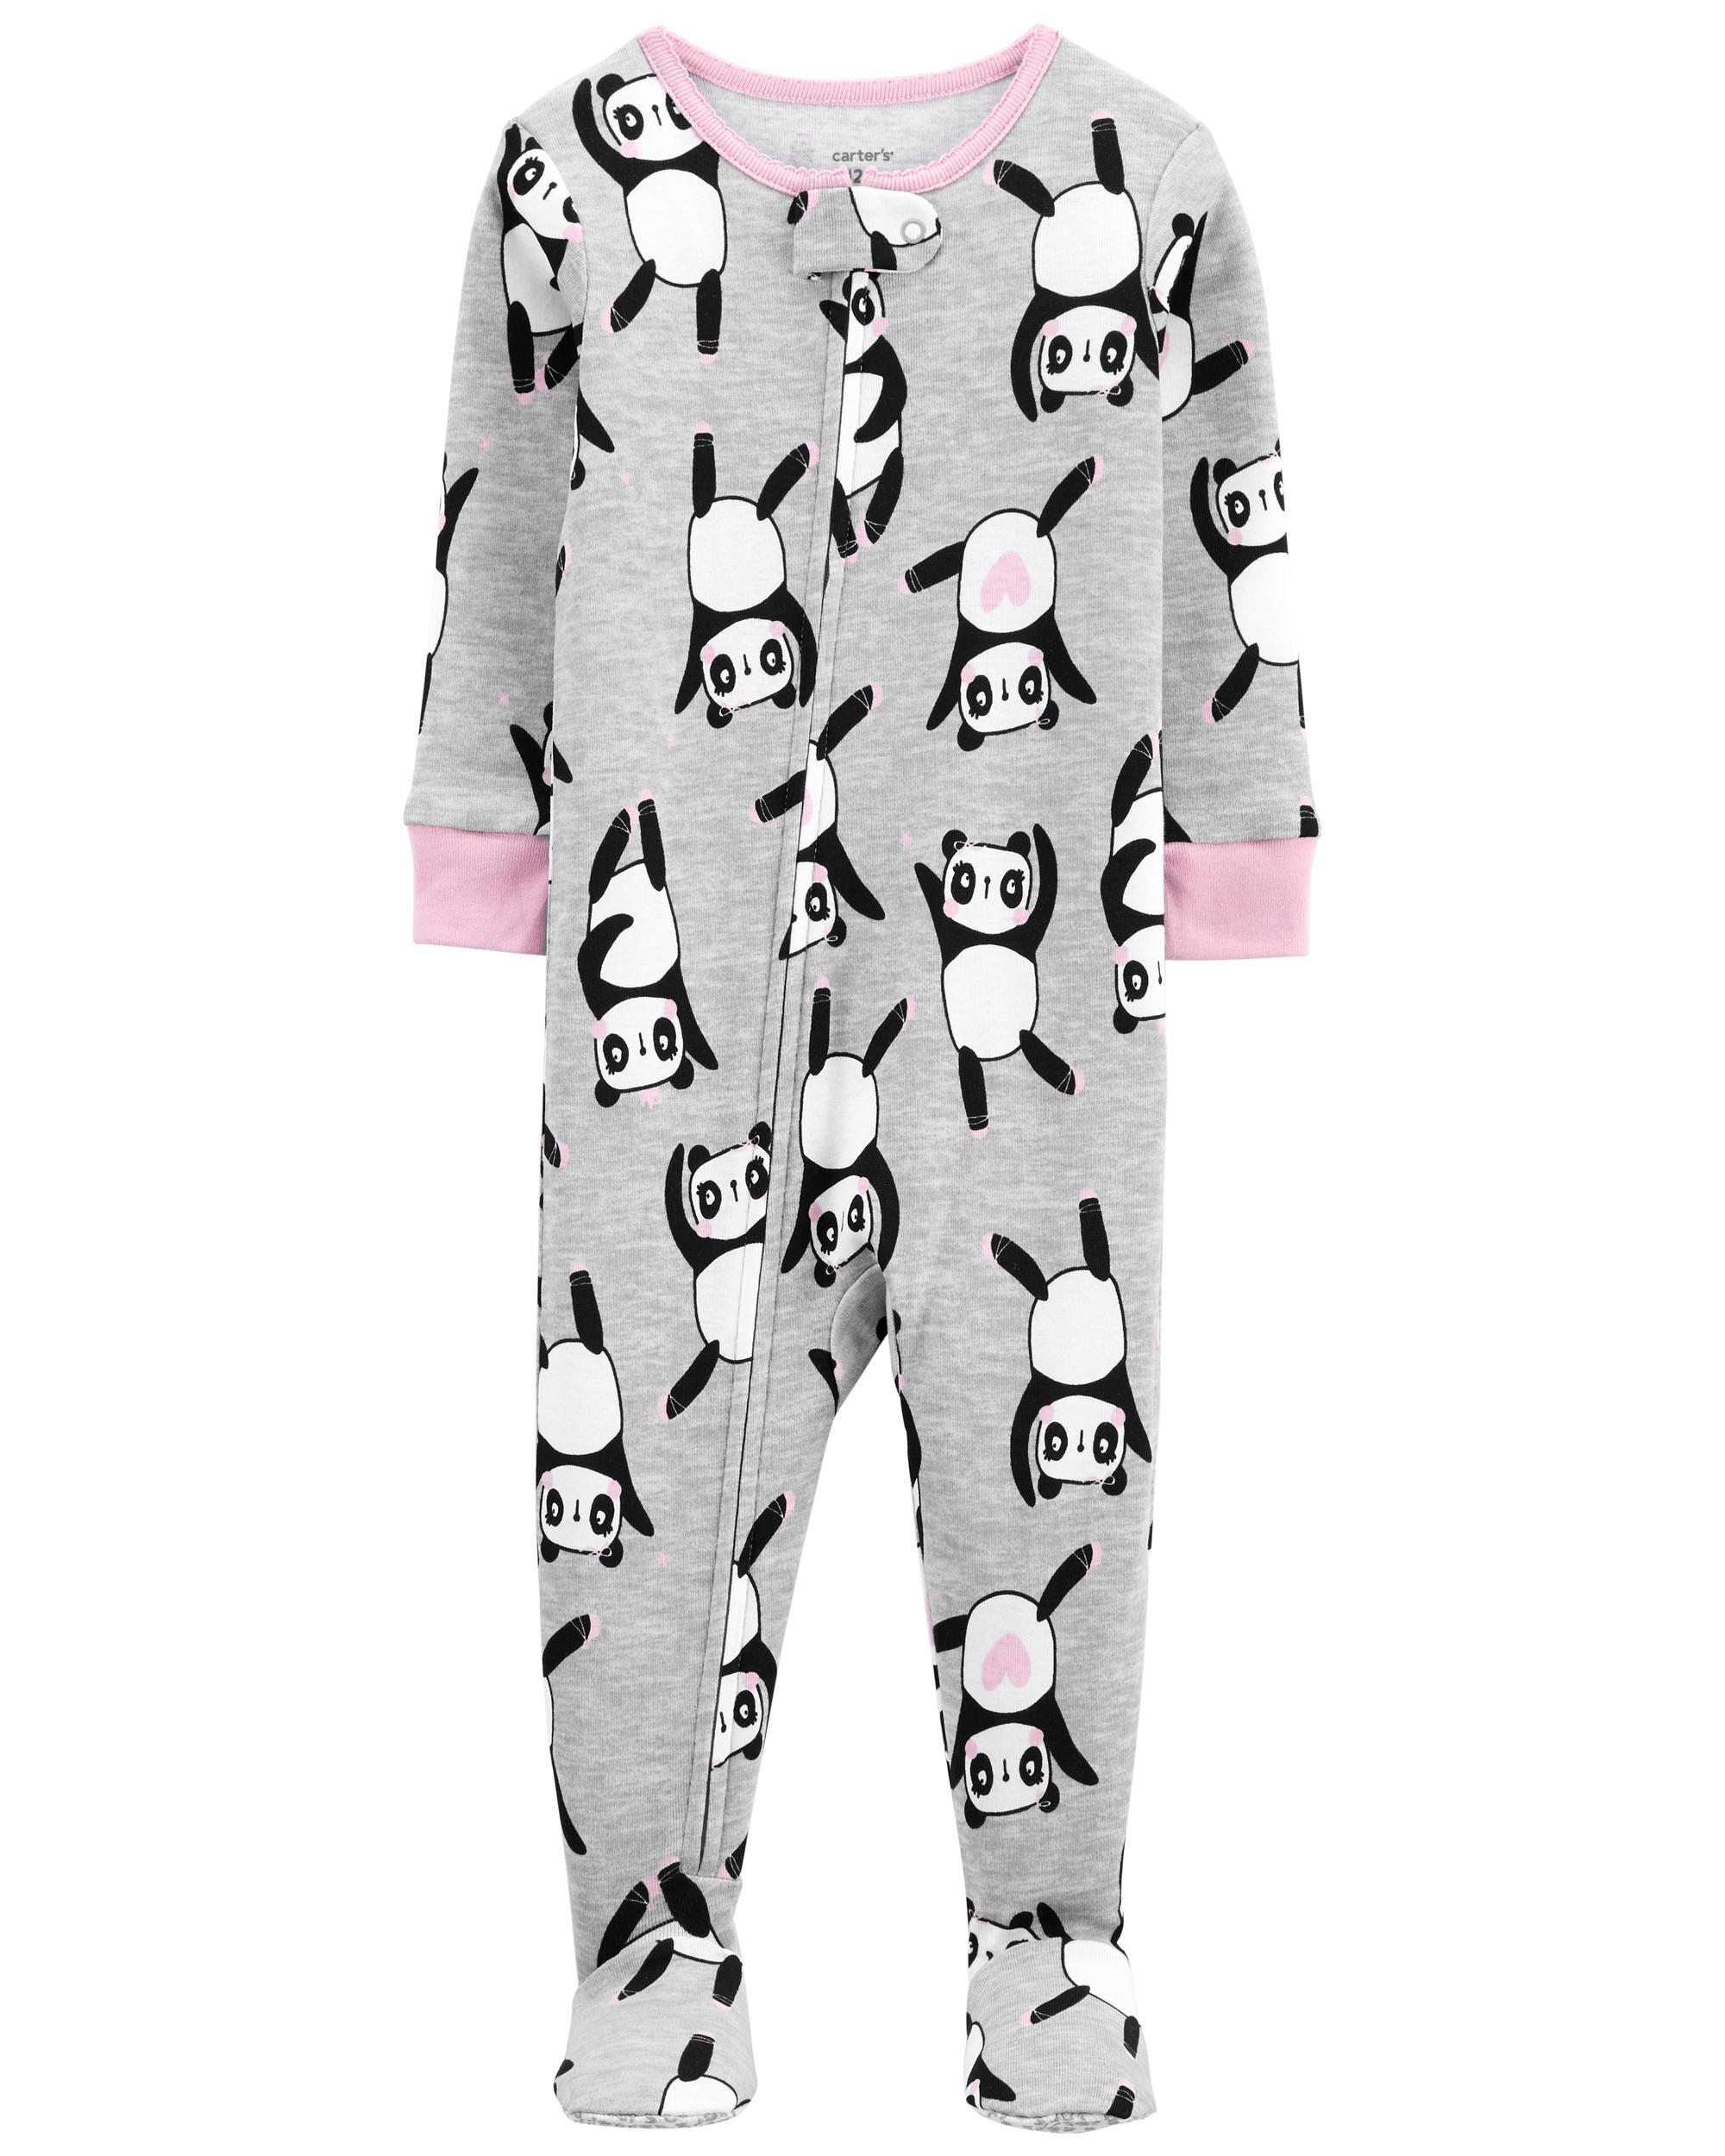 Carters 1-Piece Panda 100% Snug Fit Cotton Footie PJs